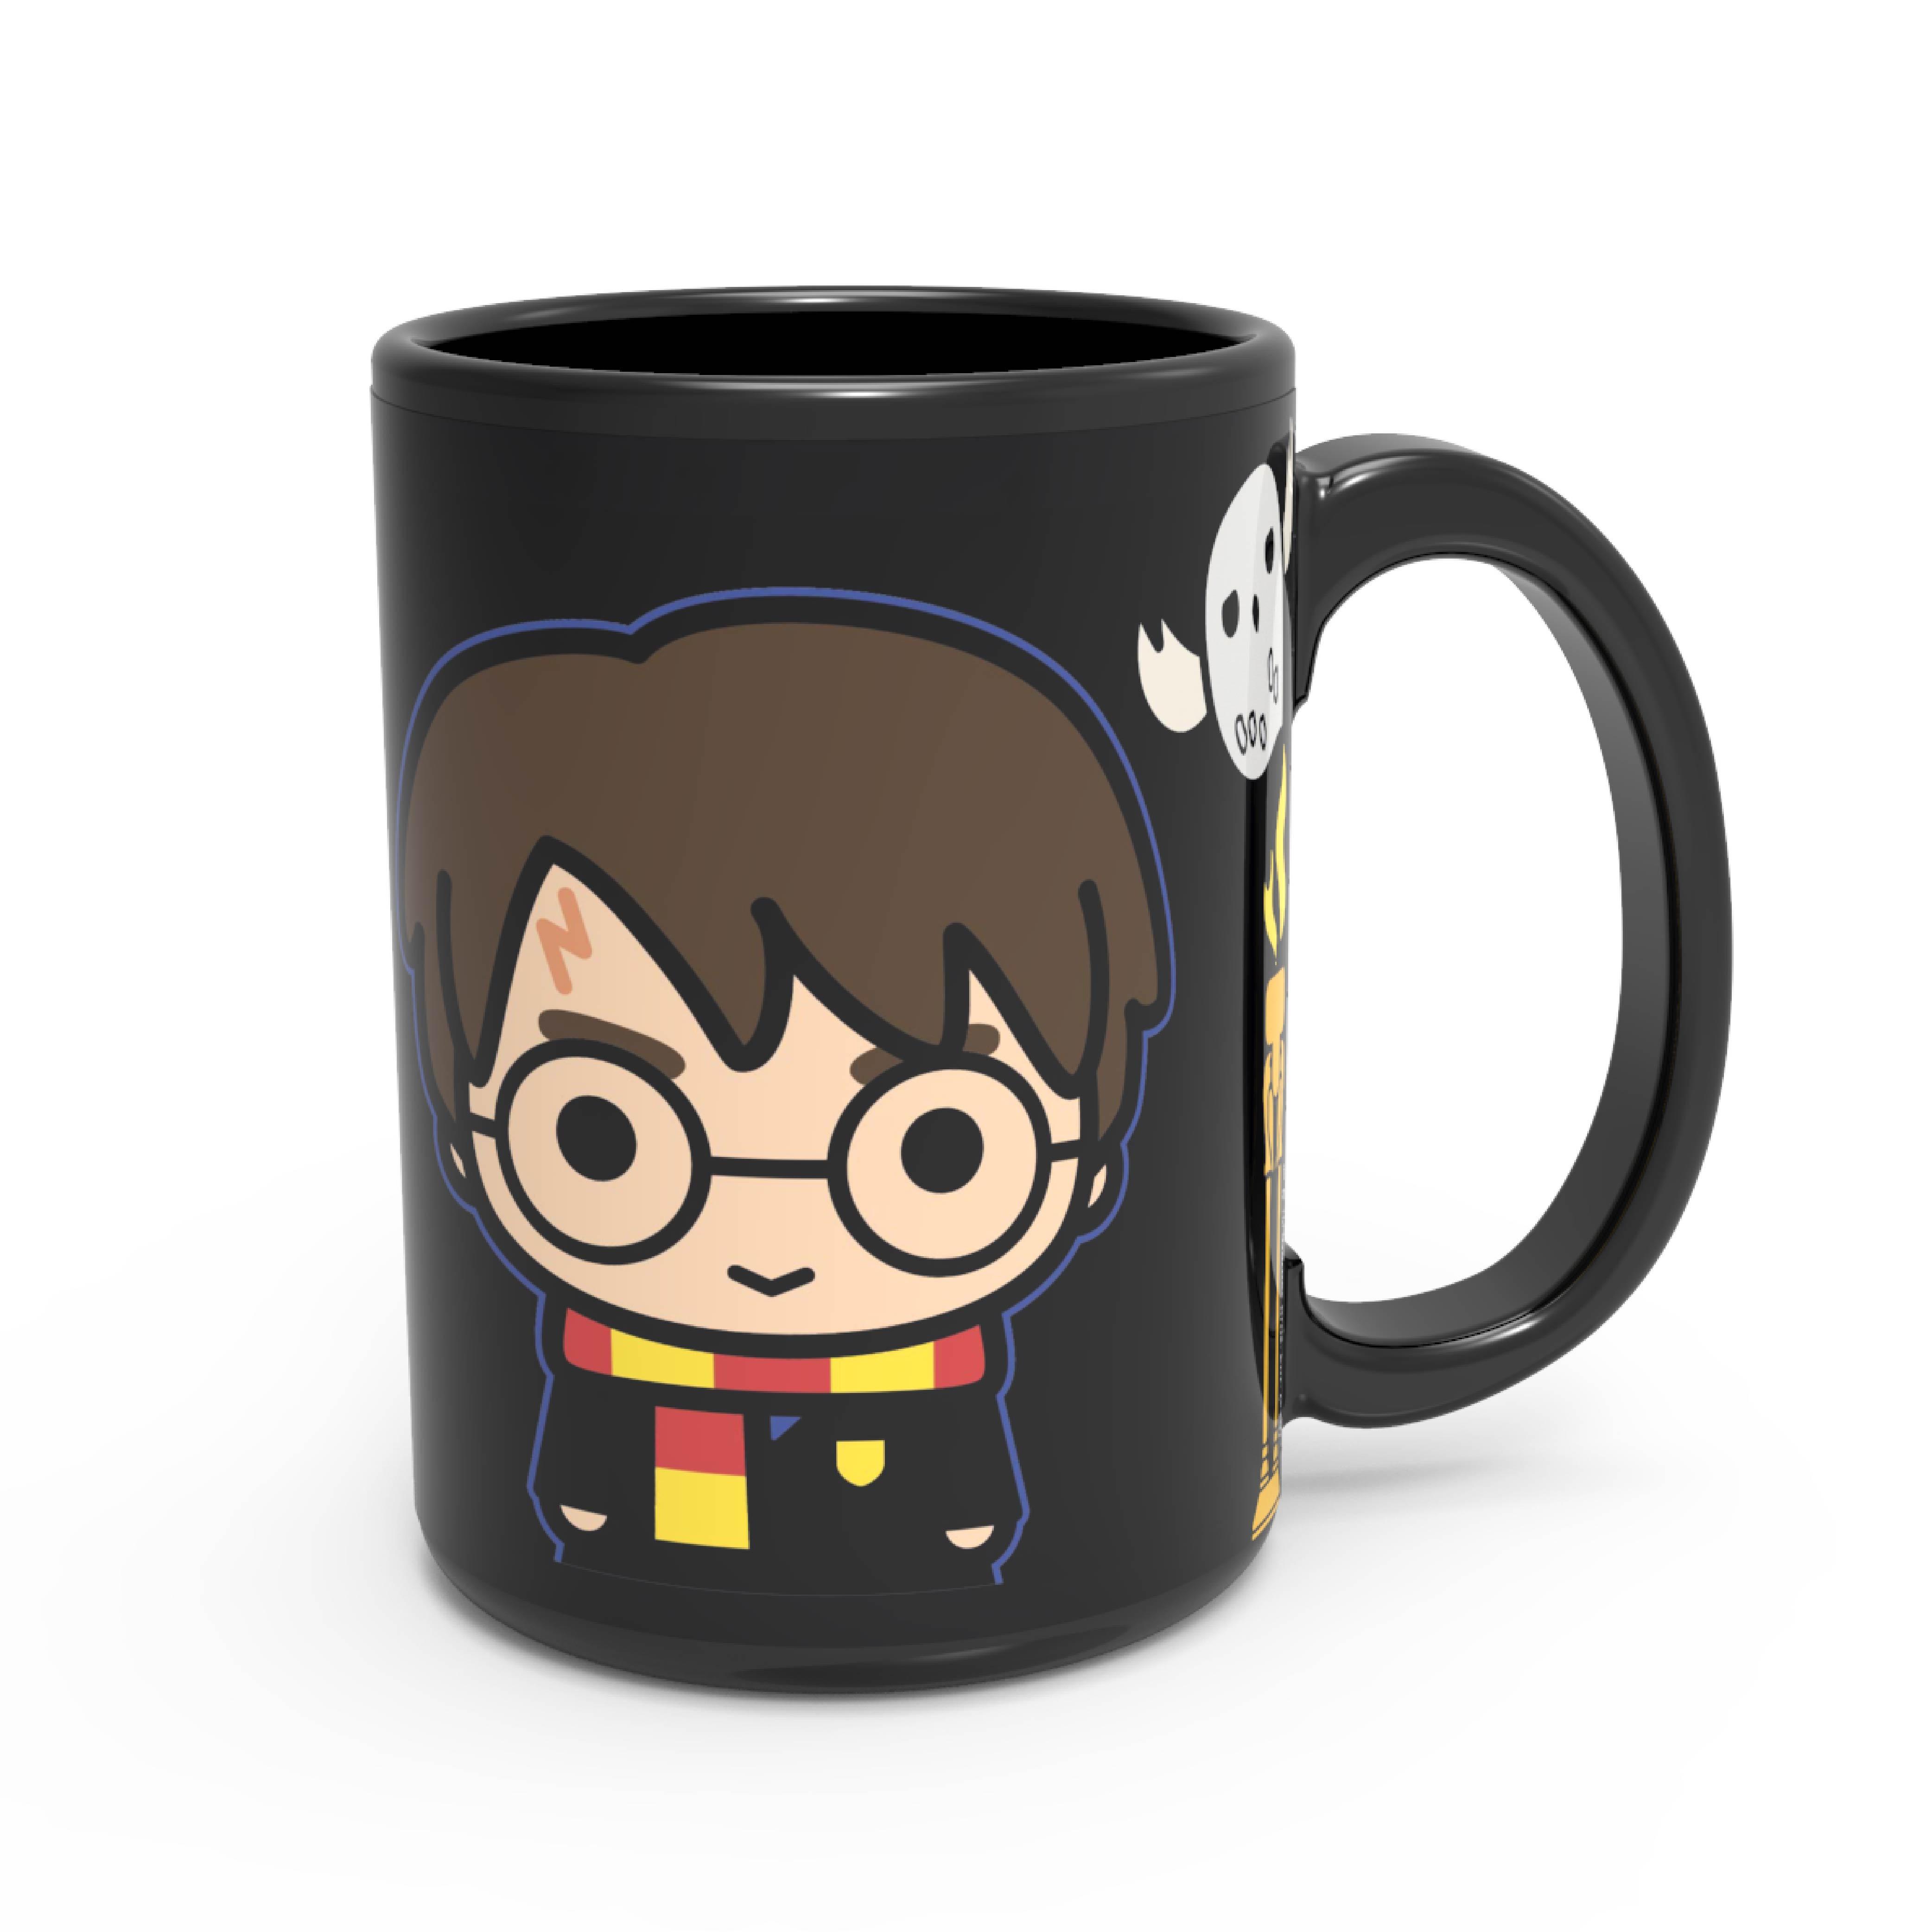 Harry Potter 15 oz. Coffee Mug, The Sorcerer's Stone slideshow image 13